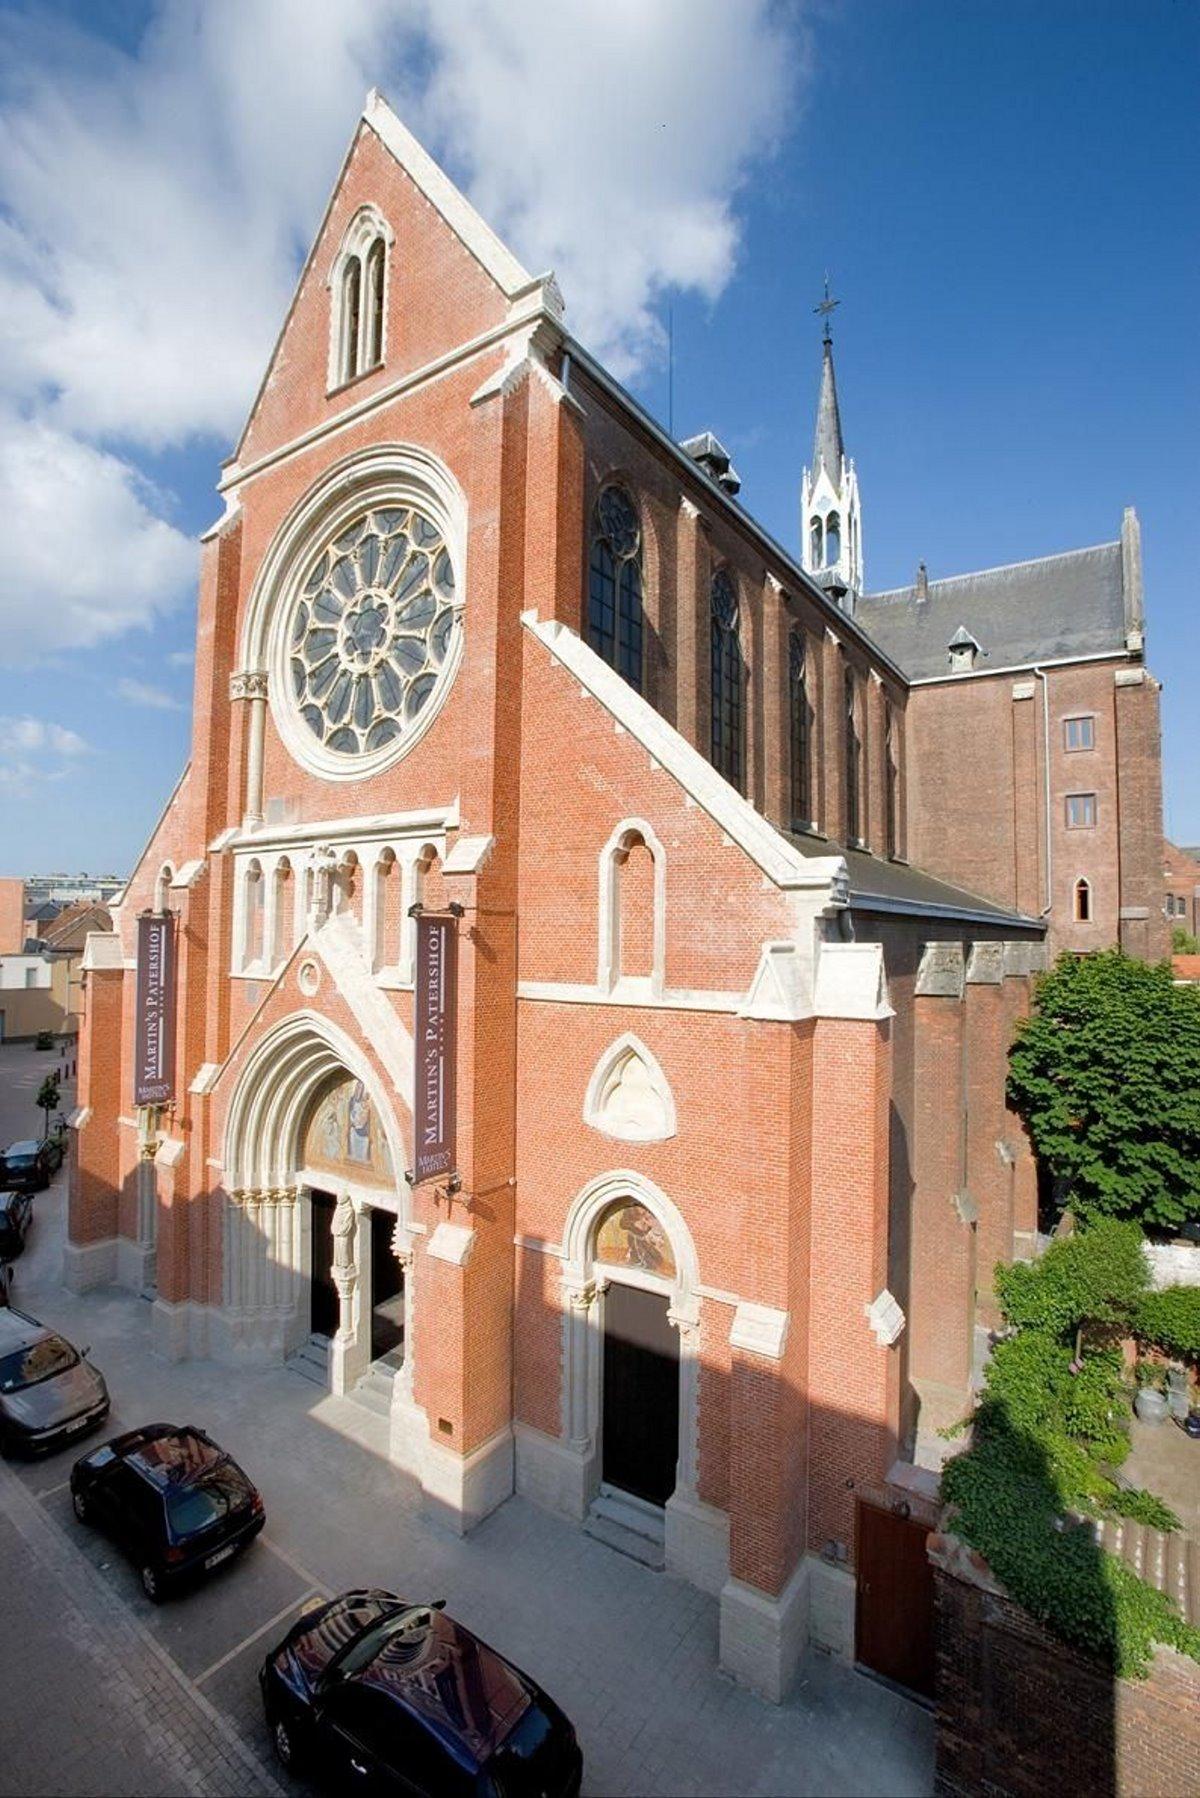 Martin's Patershof, Μεσελέν, Βέλγιο